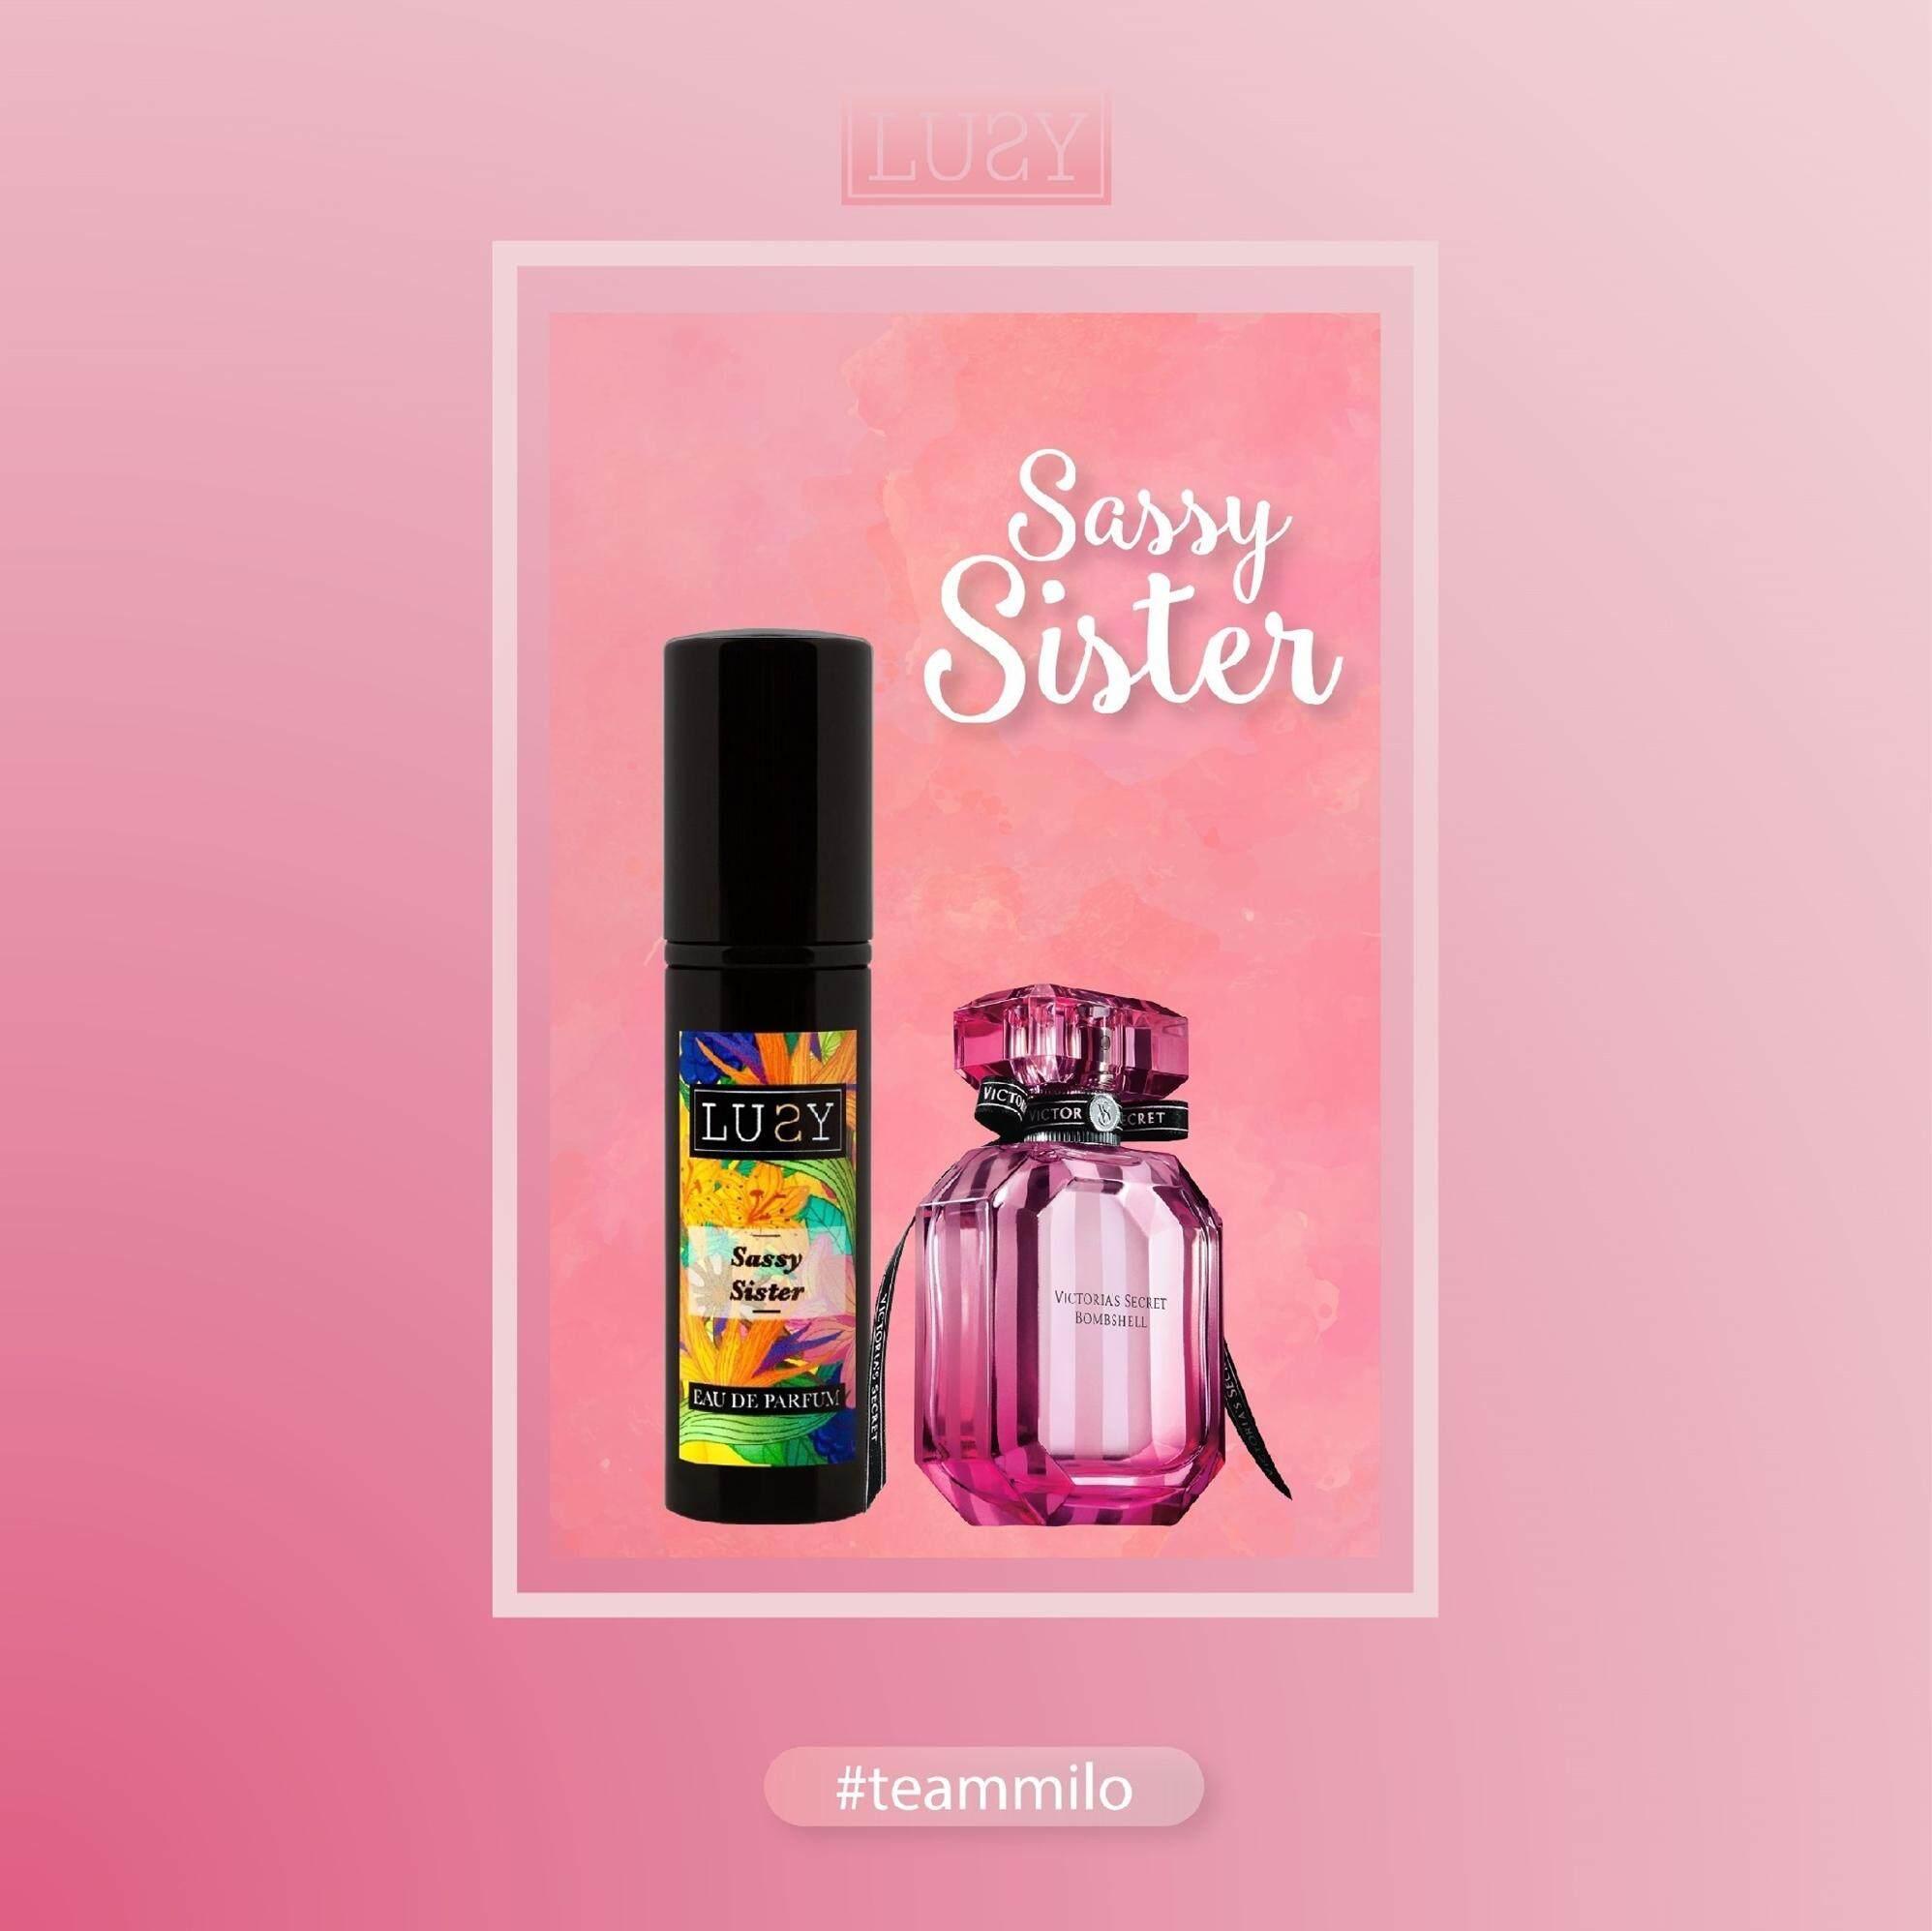 LUSY SASSY SISTER